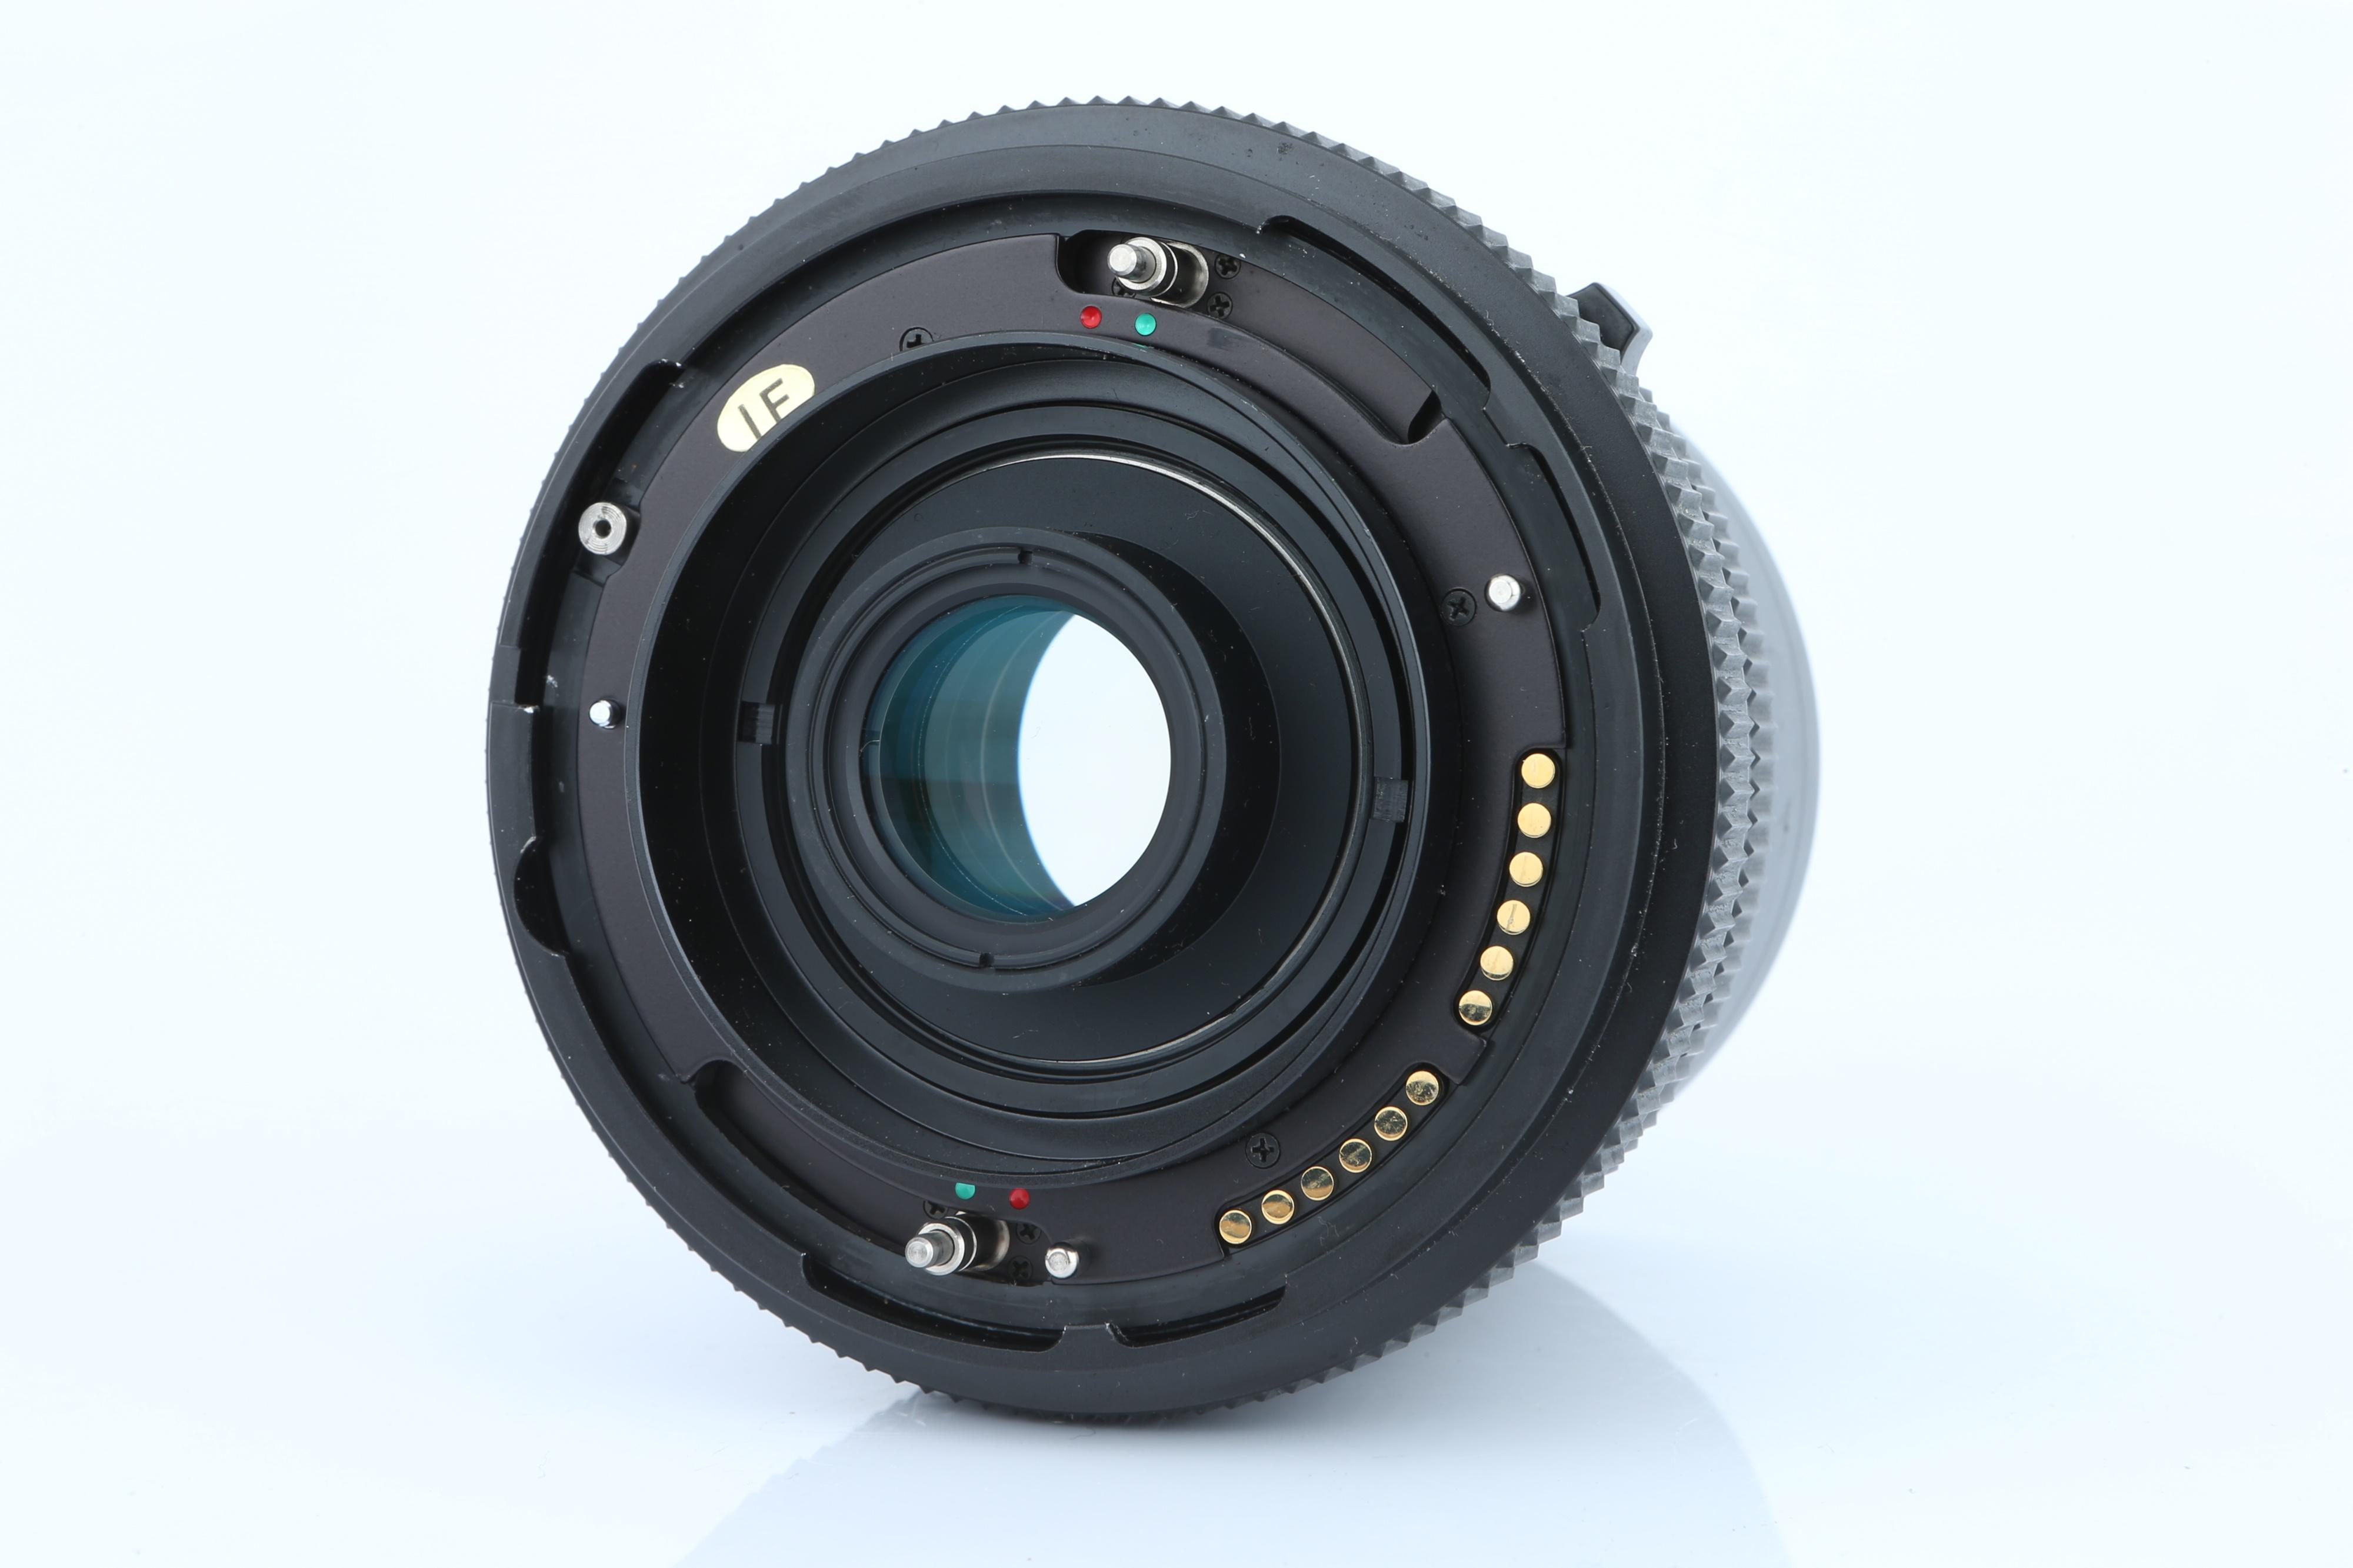 A Mamiya-Sekor Z W f/4.5 50mm Lens, - Image 2 of 3